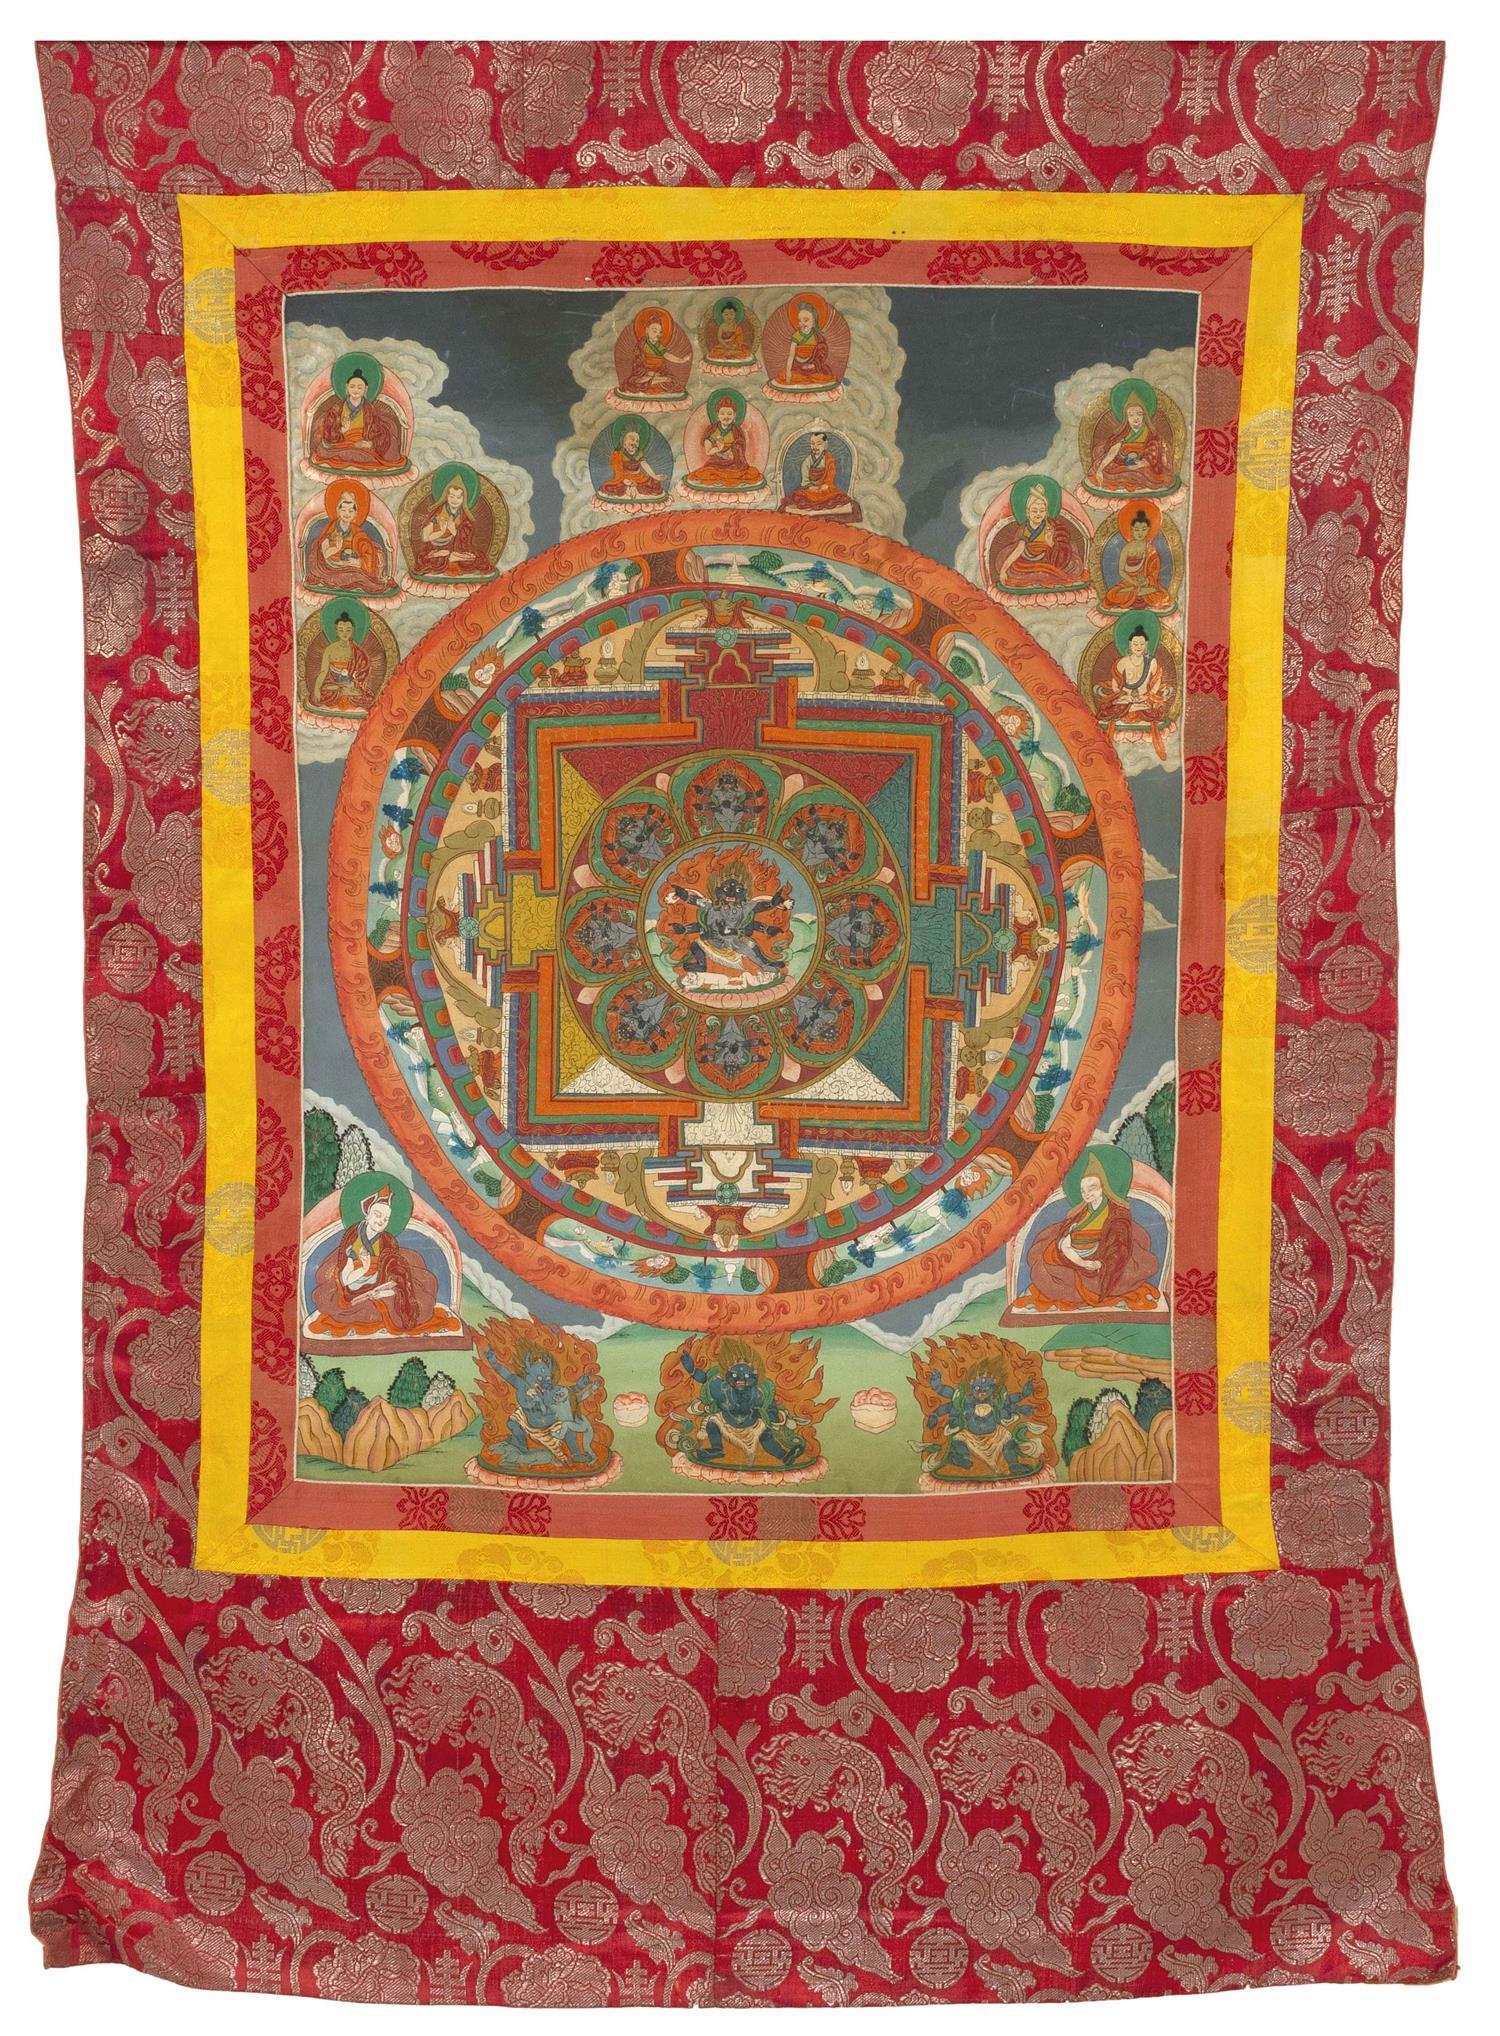 "TIBETAN THANKA In mandala design, with central figure of Mahakala surrounded by various deities. 30"" x 22""."